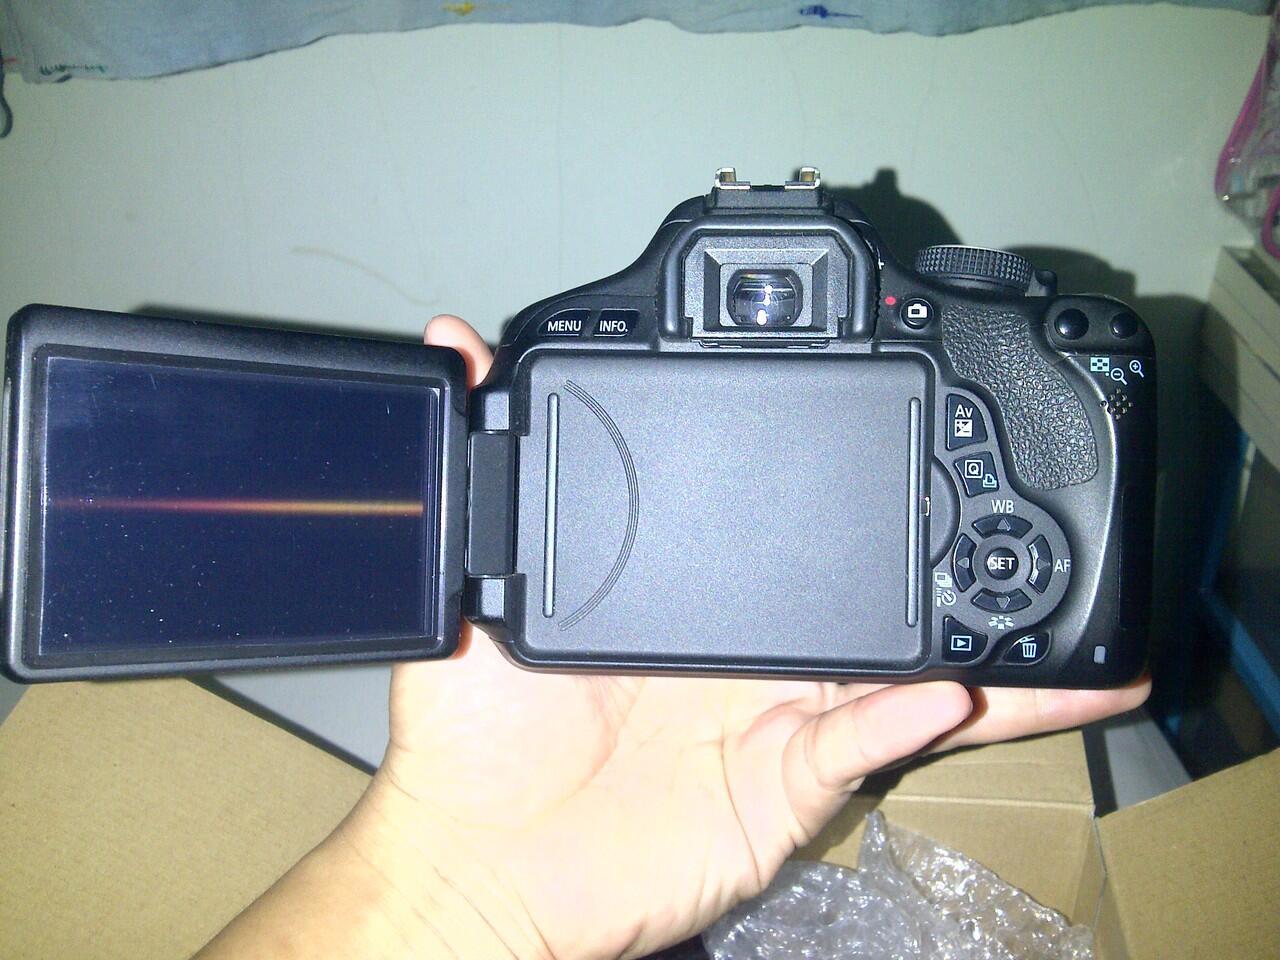 Jual kamera Canon EOS 600D/Rebel T3i BO+lensa kit 18-55mm[made in Jepang]-Murah Bgt